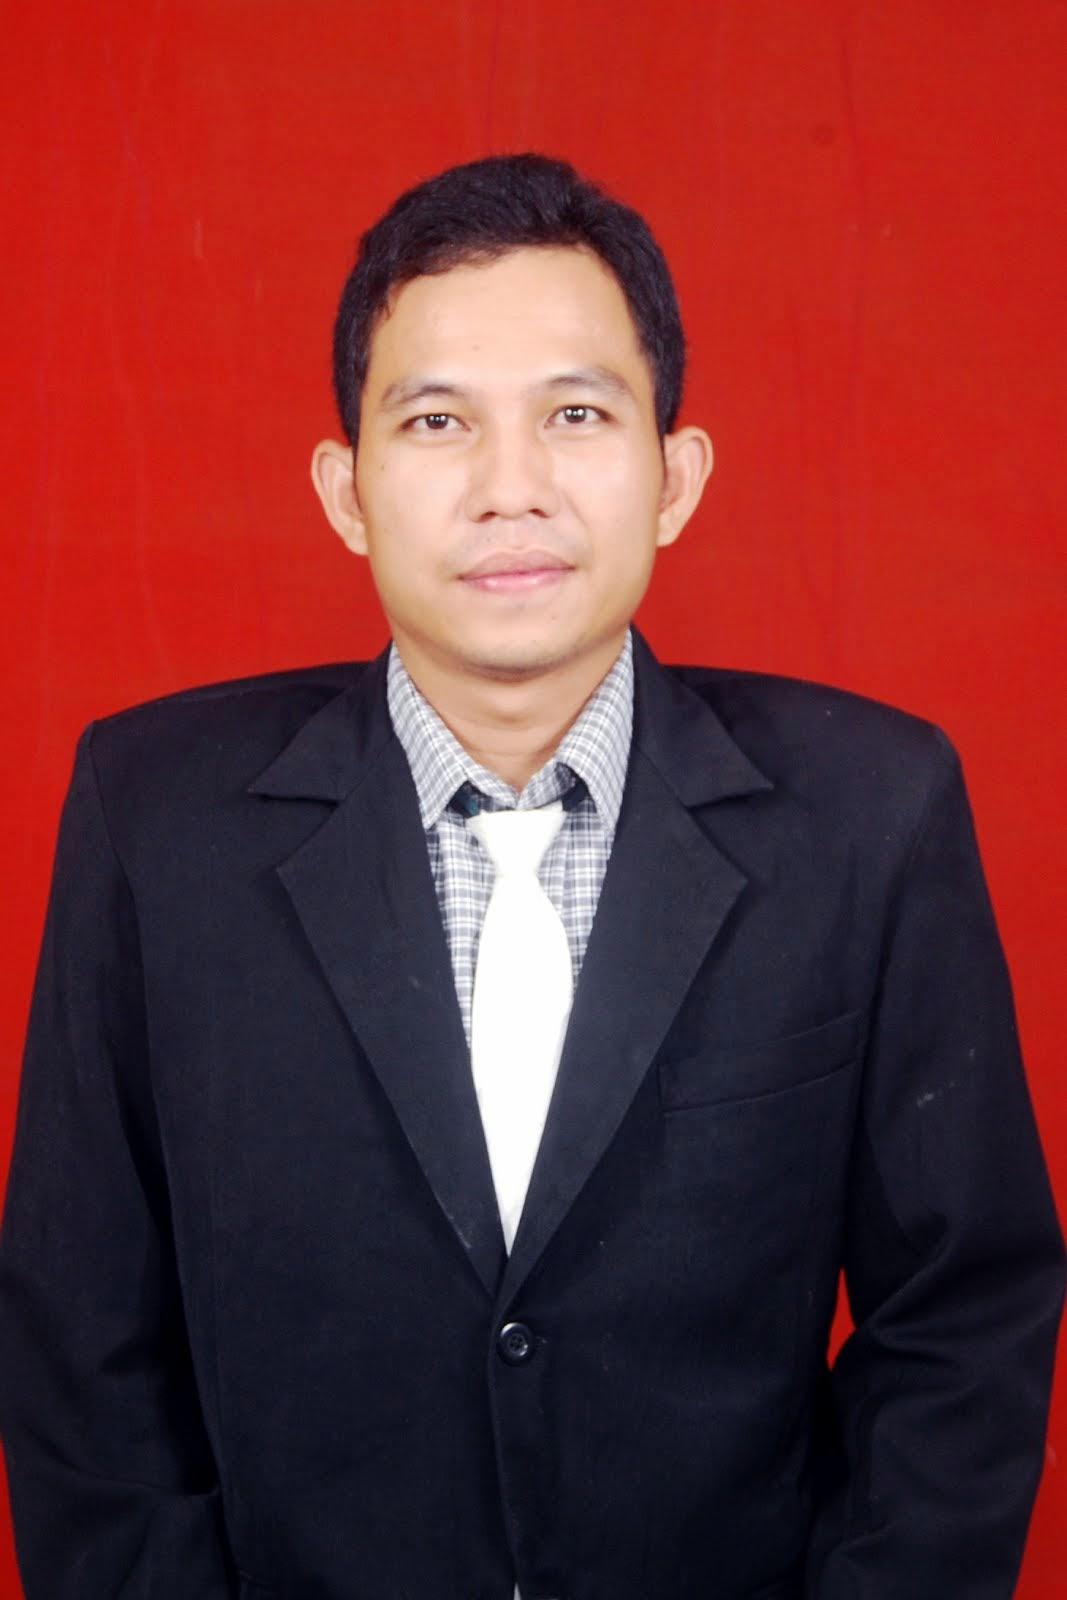 Manager Erhice Konveksi